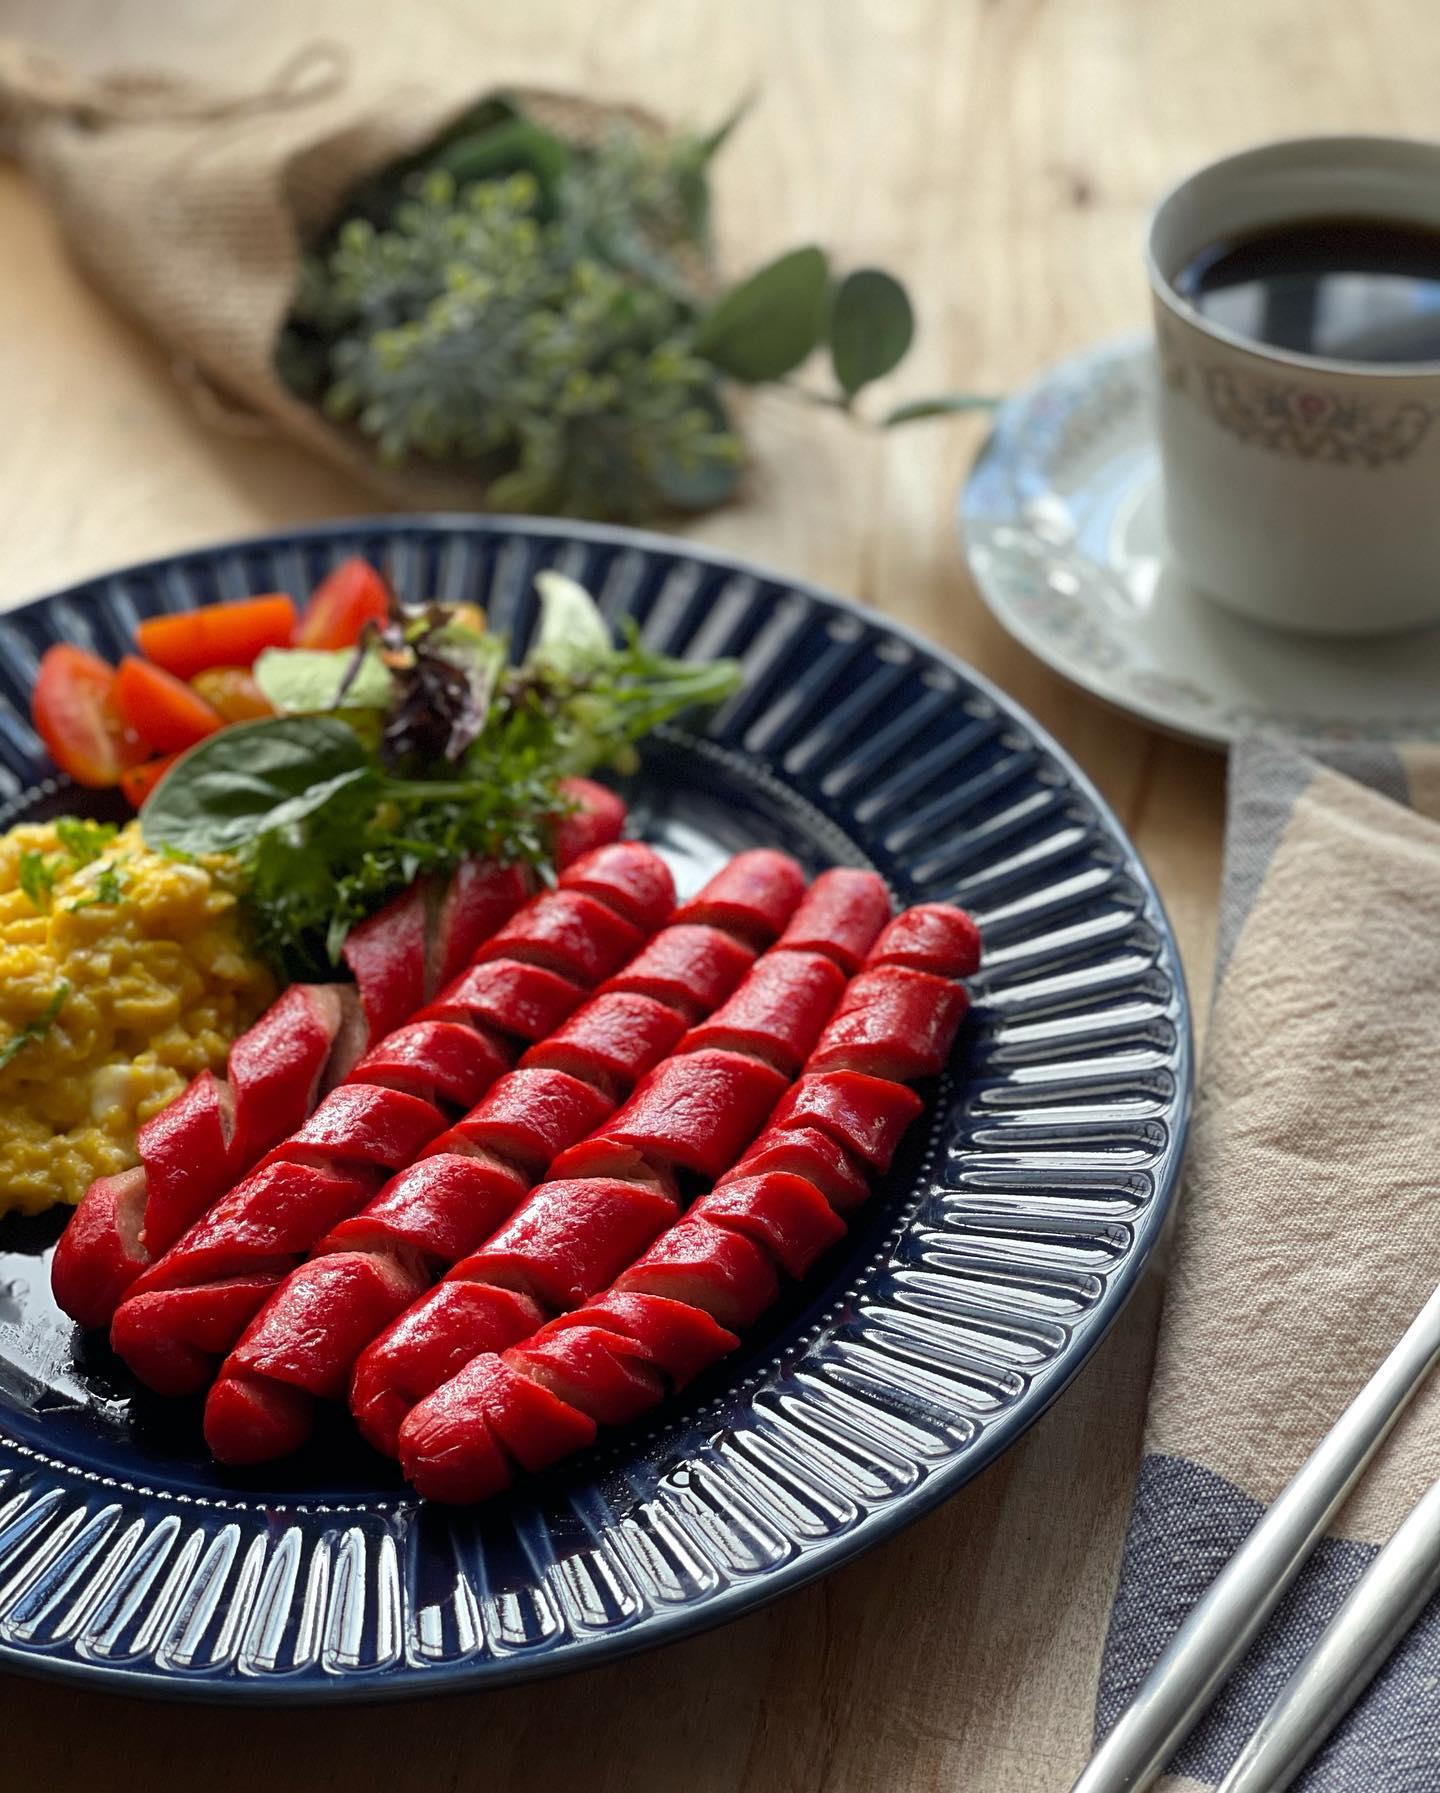 Classic American Breakfast - Hotdog with Scrambled Eggs - House of Hazelknots